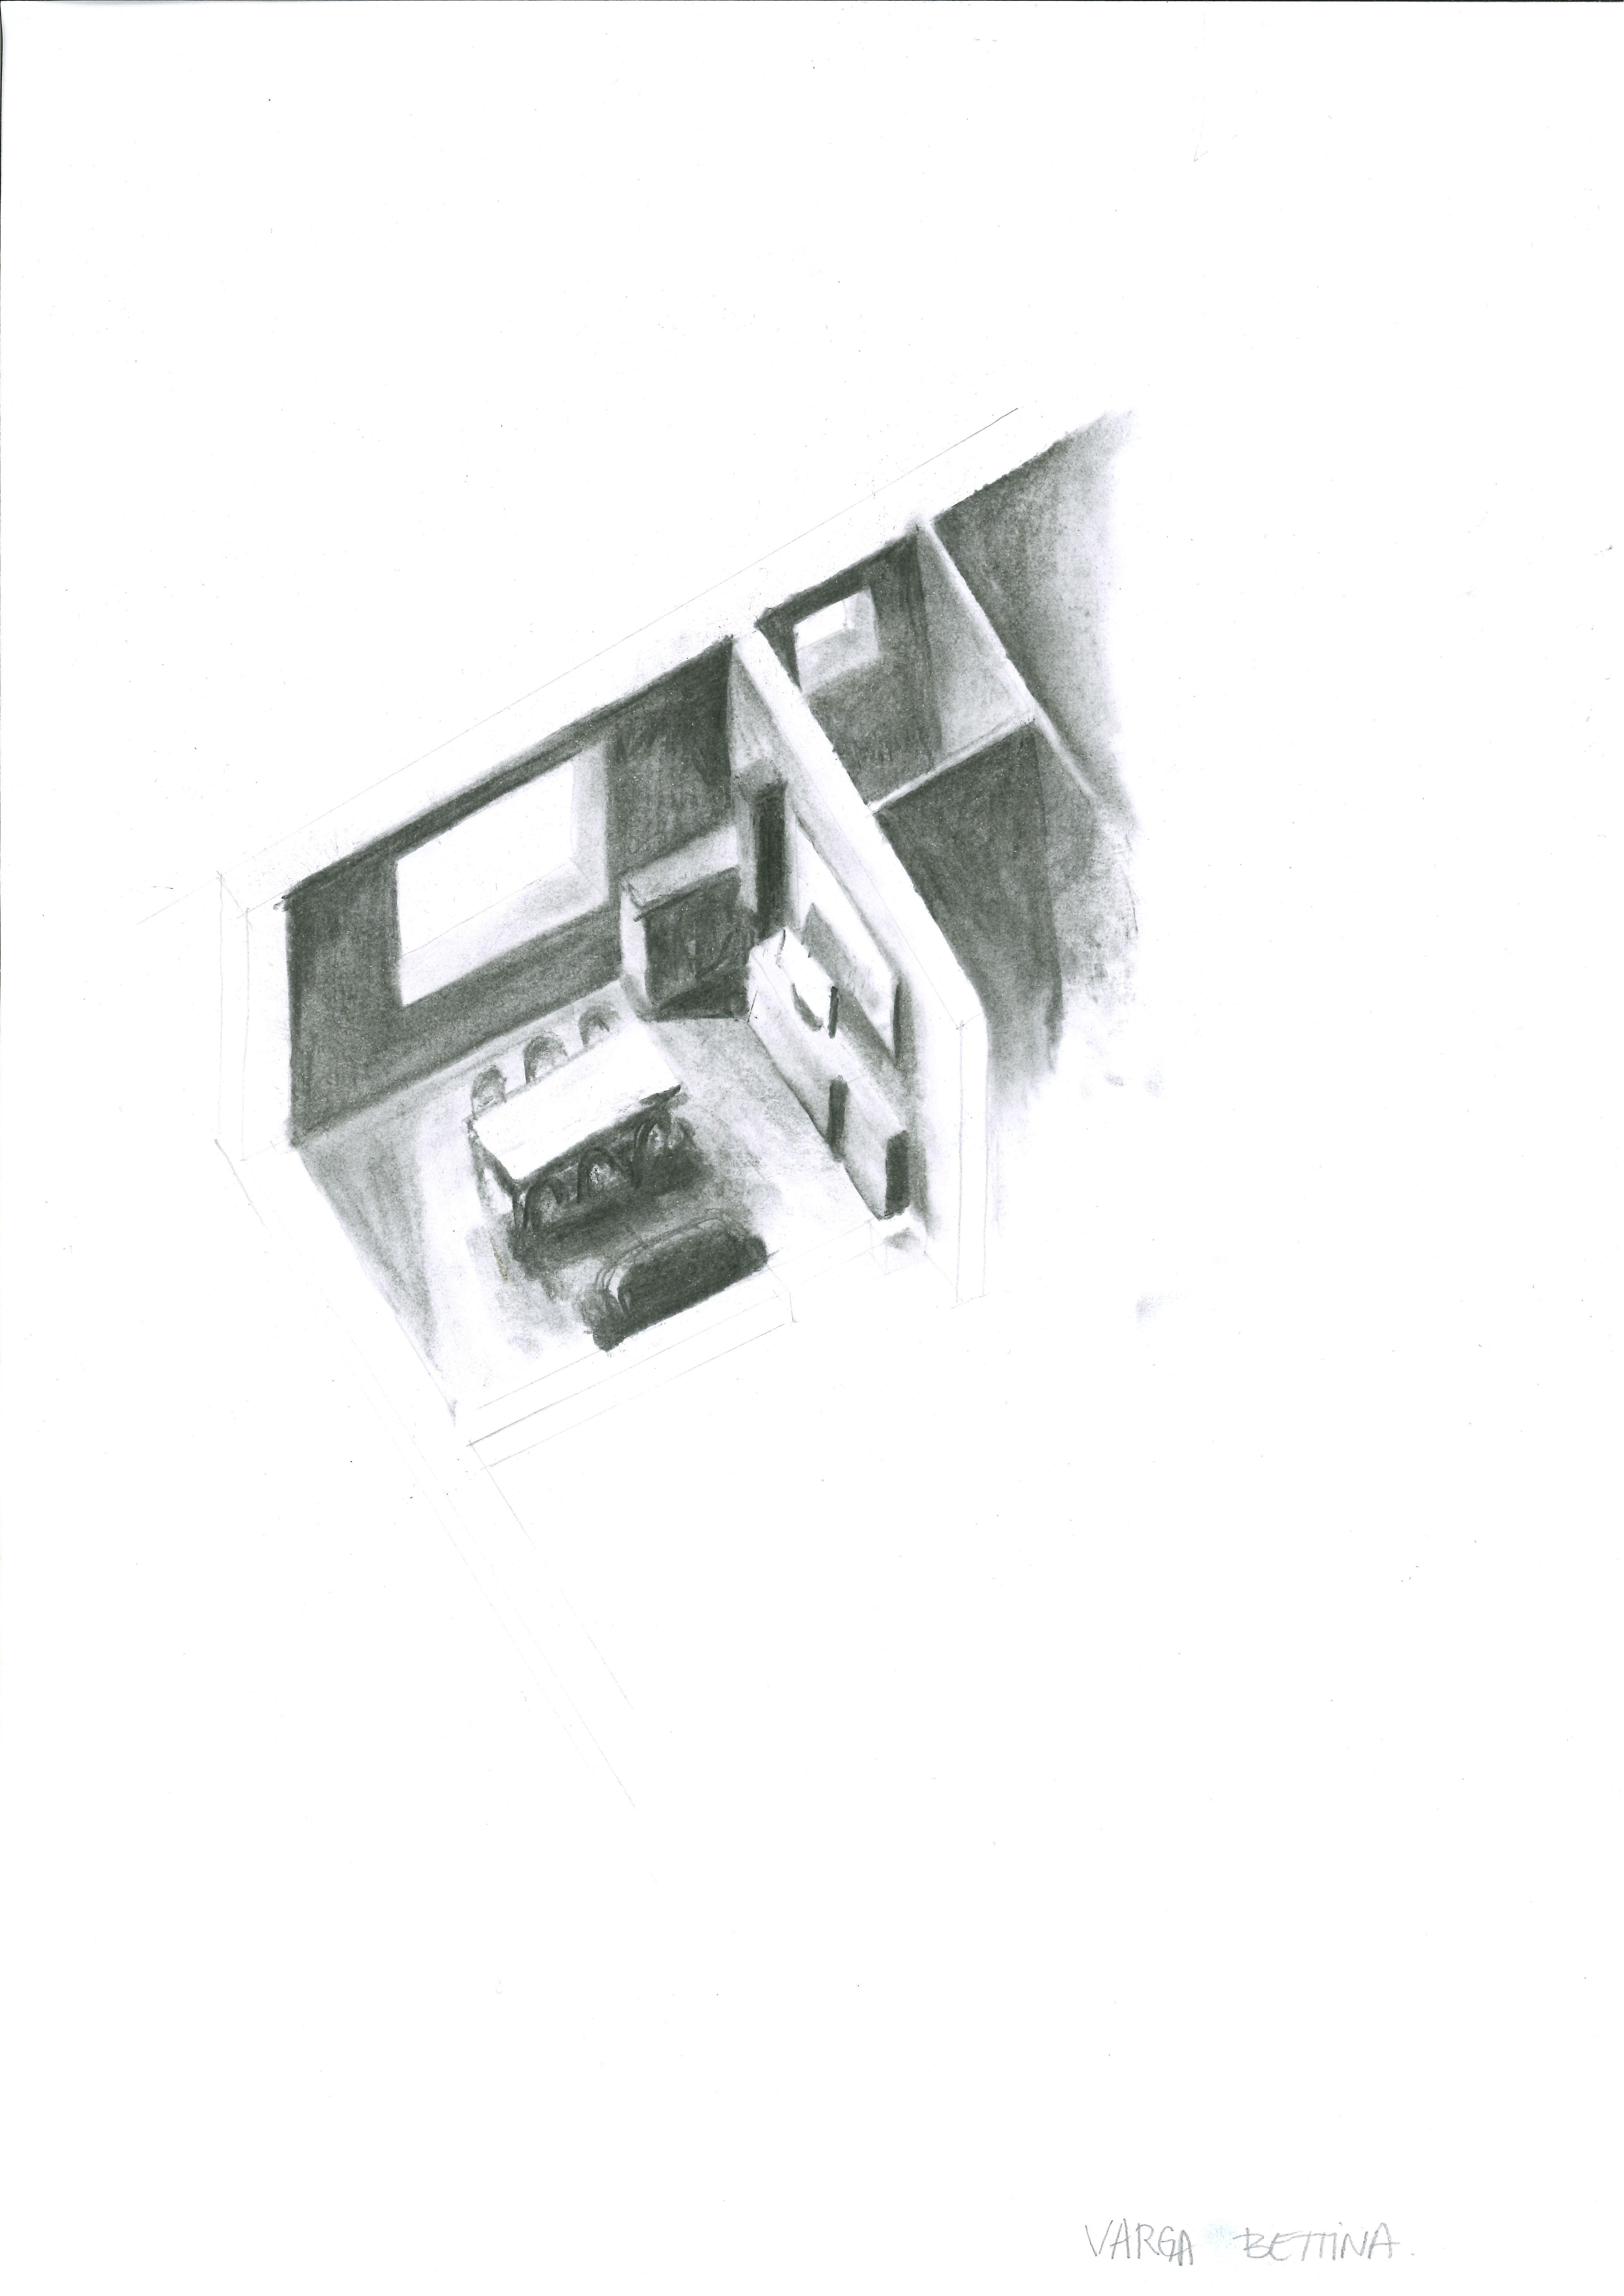 BUCHAREST-lab-ARRET SUR IMAGE 190222-sierranevada-21fev-a3__Page_02